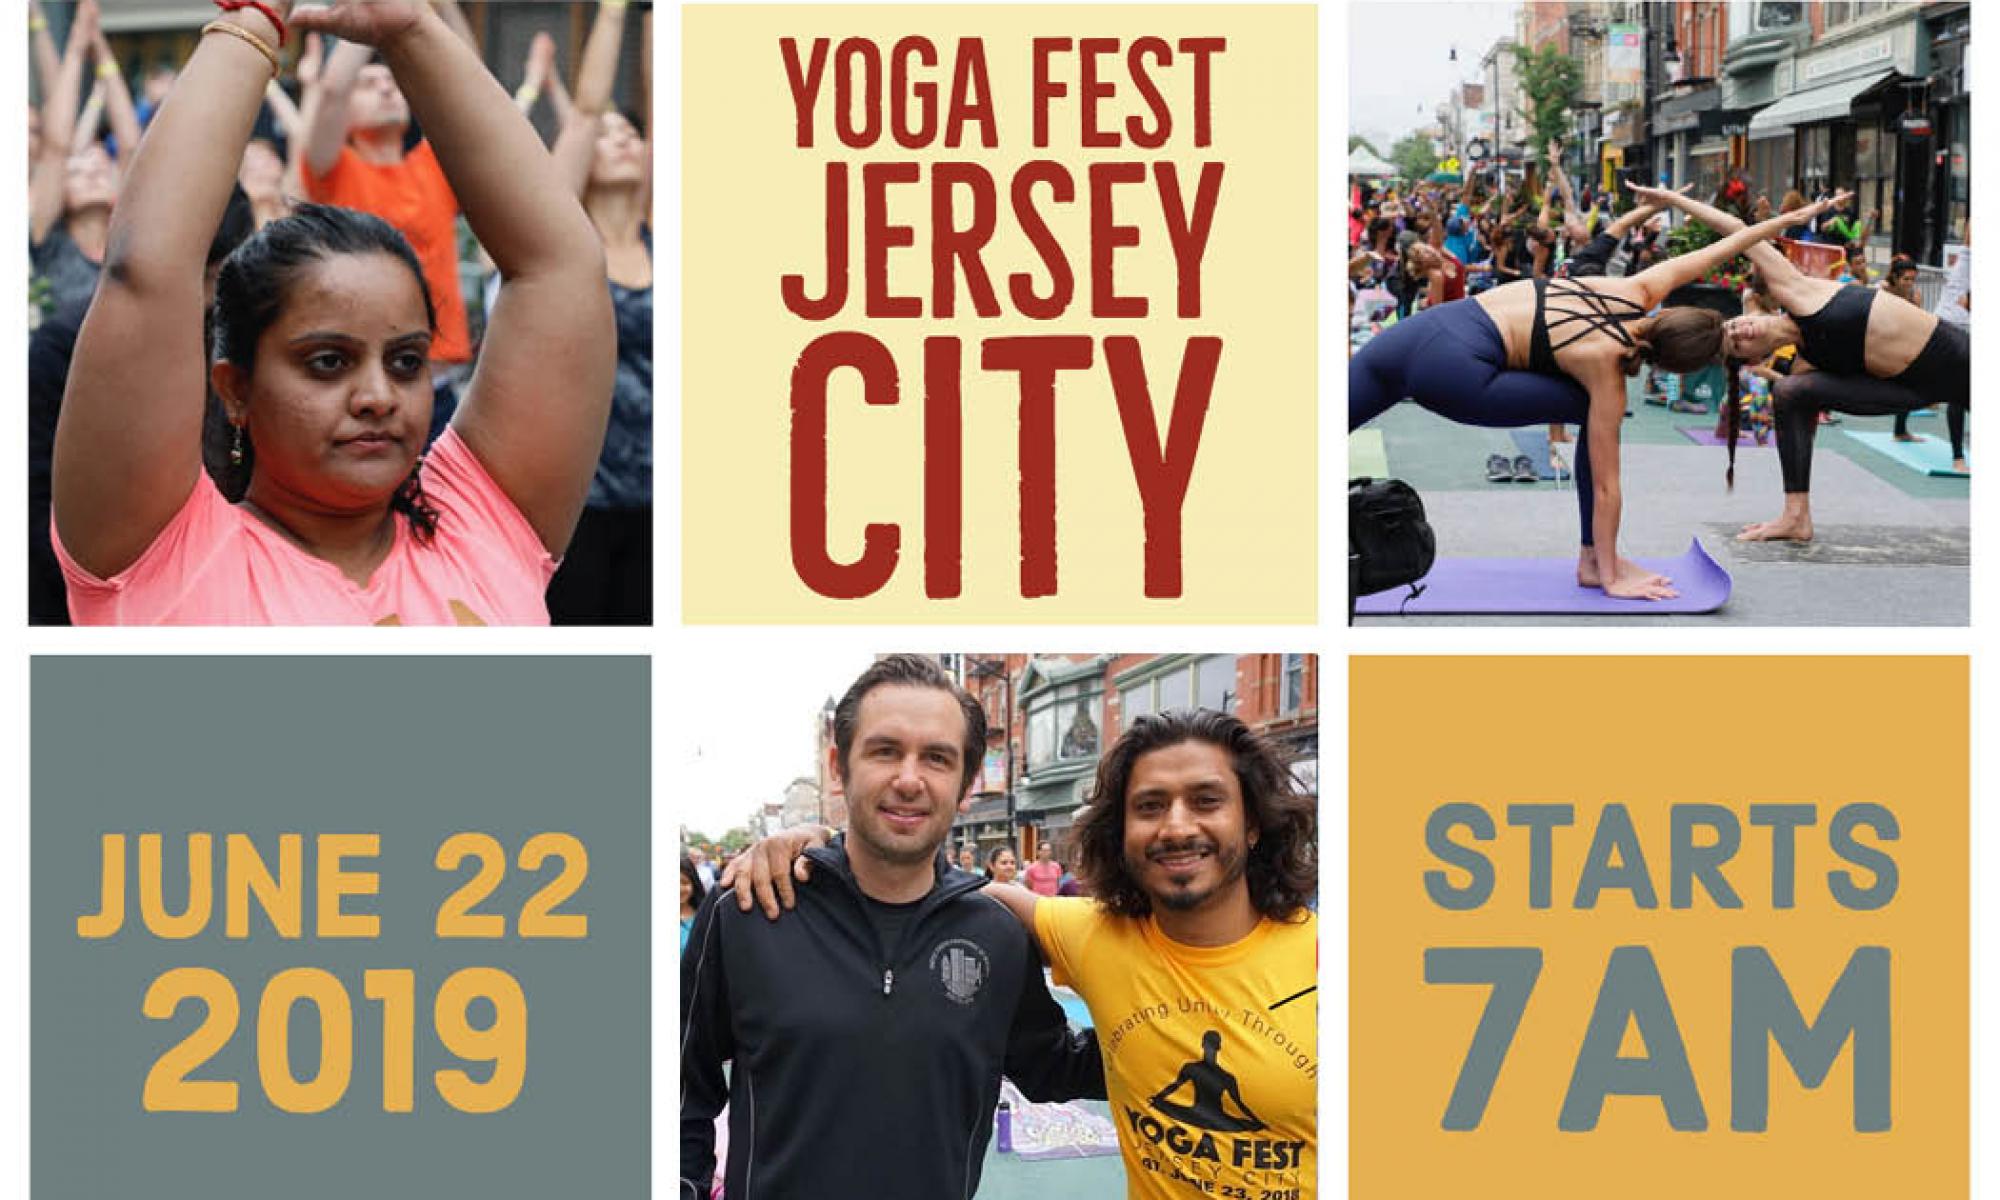 Yoga Fest Jersey City